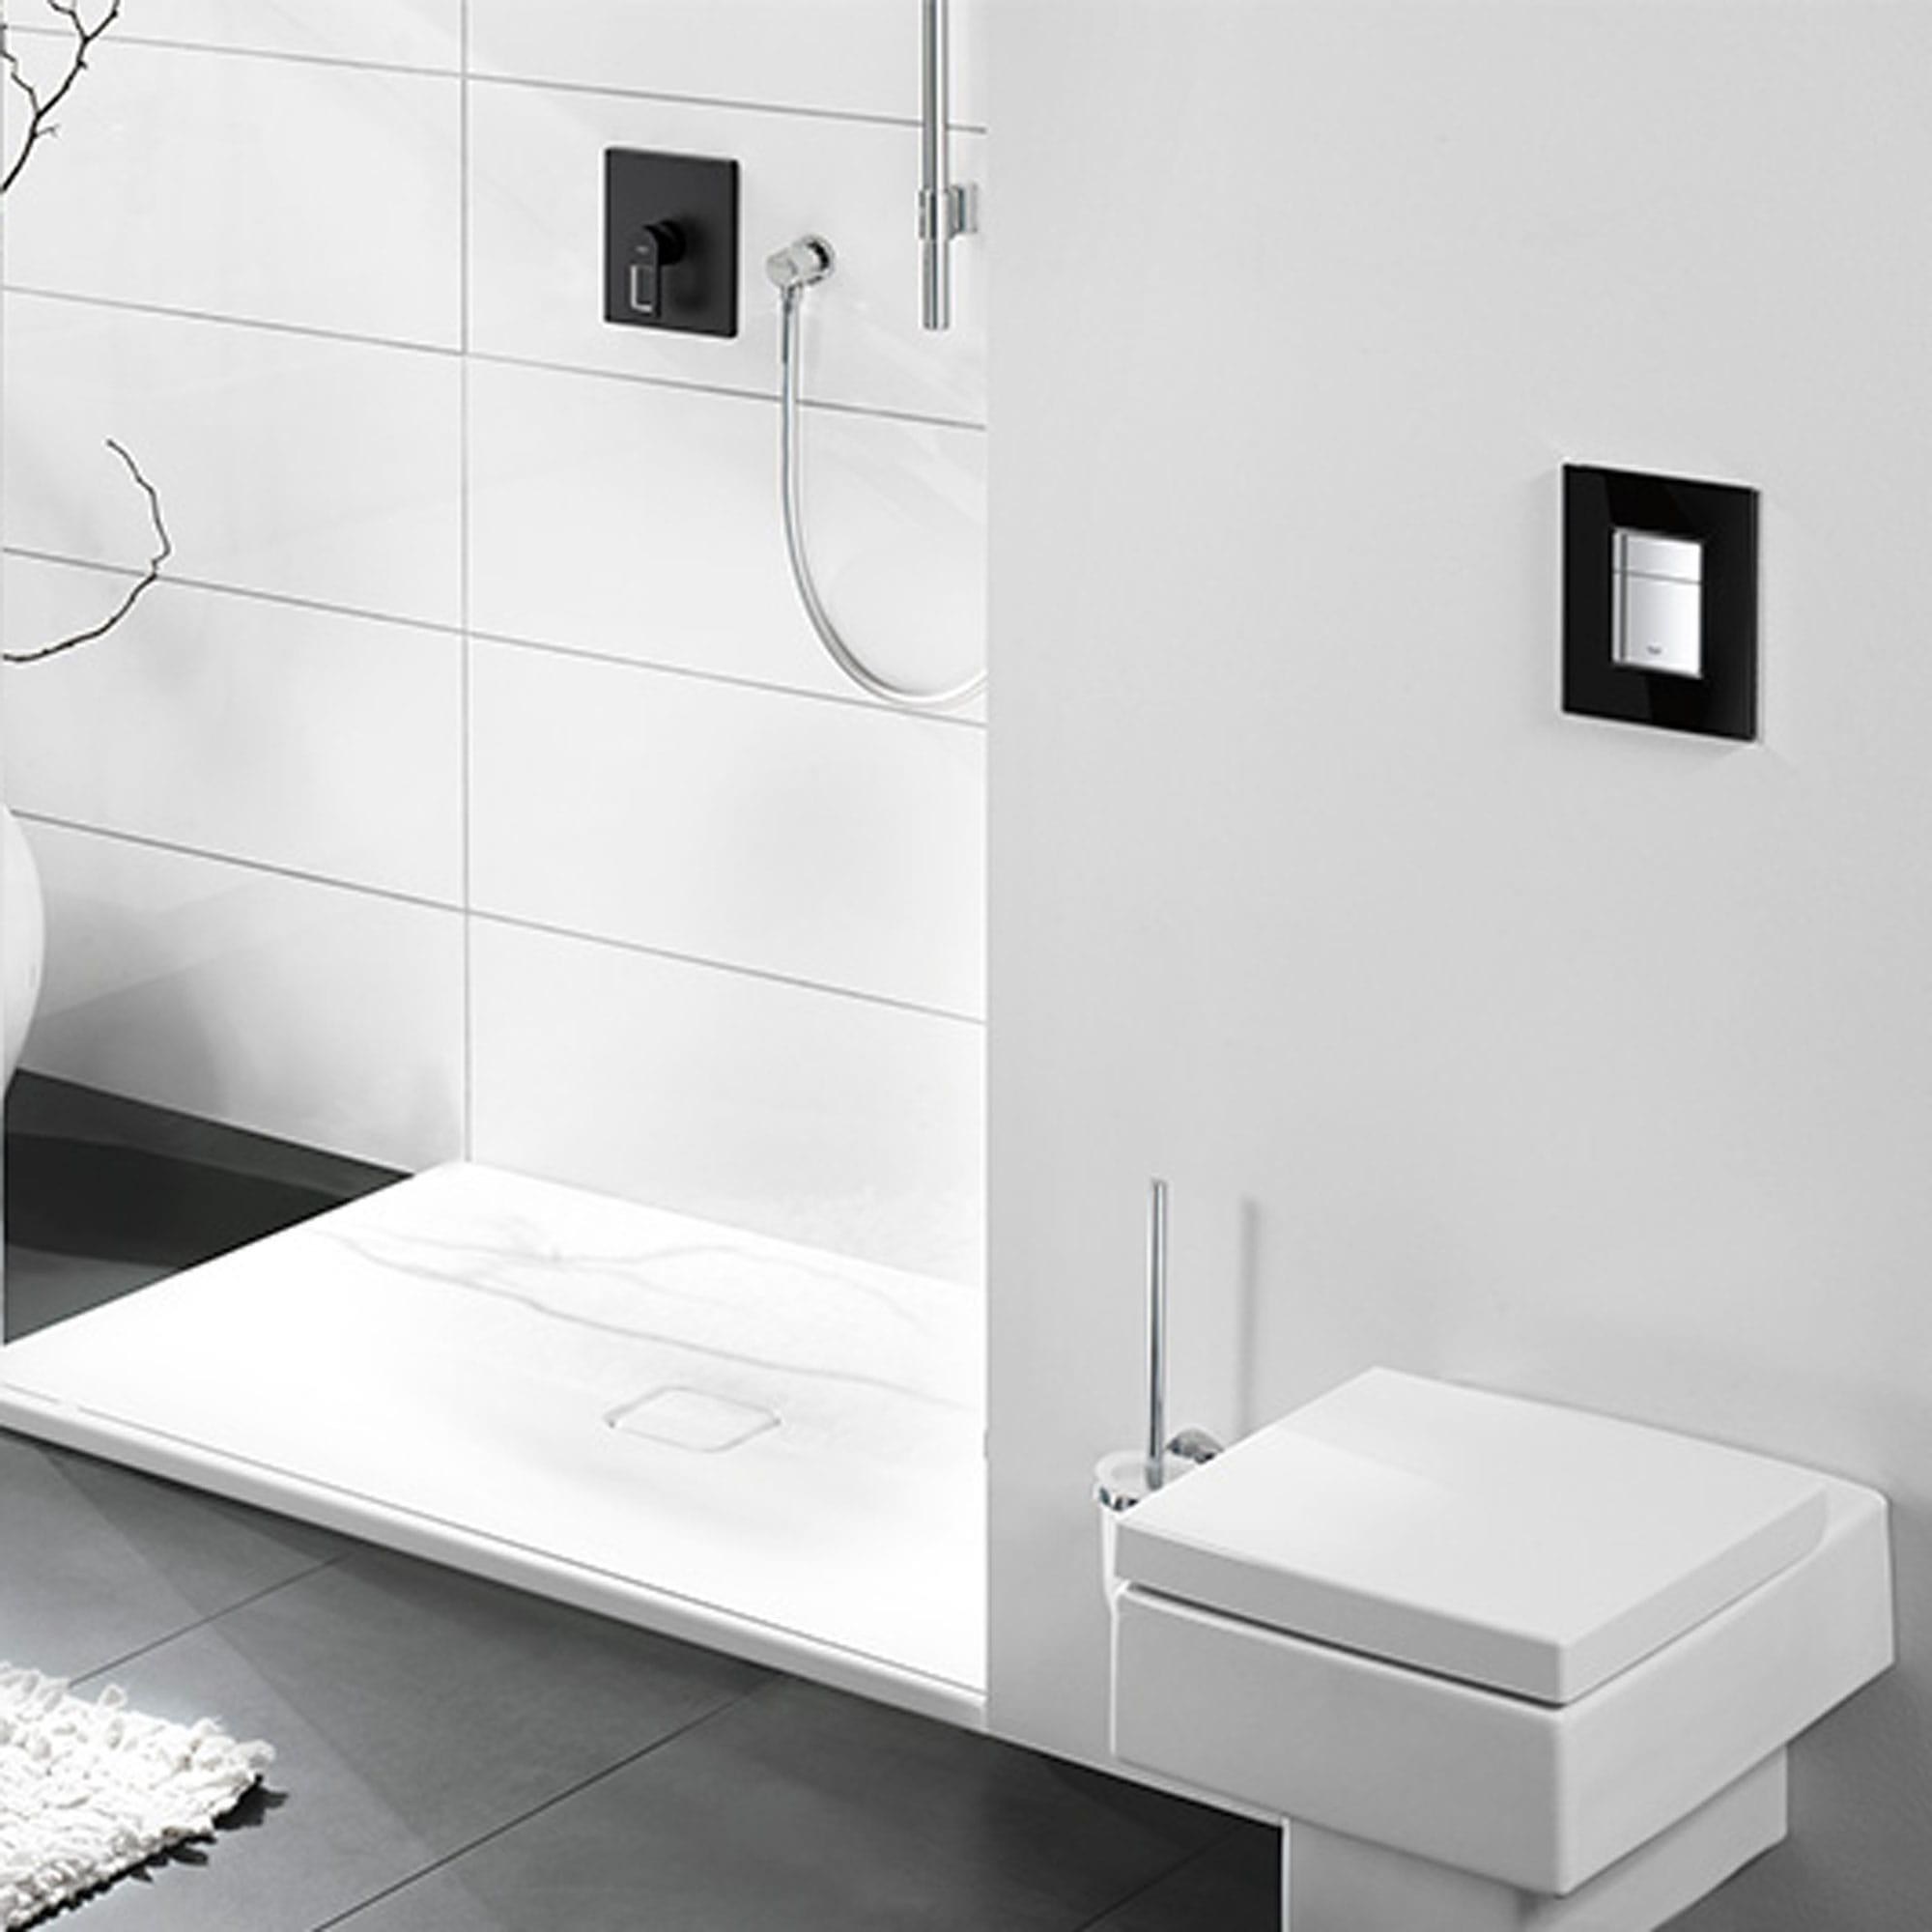 Square flush plate in a grey bathroom.